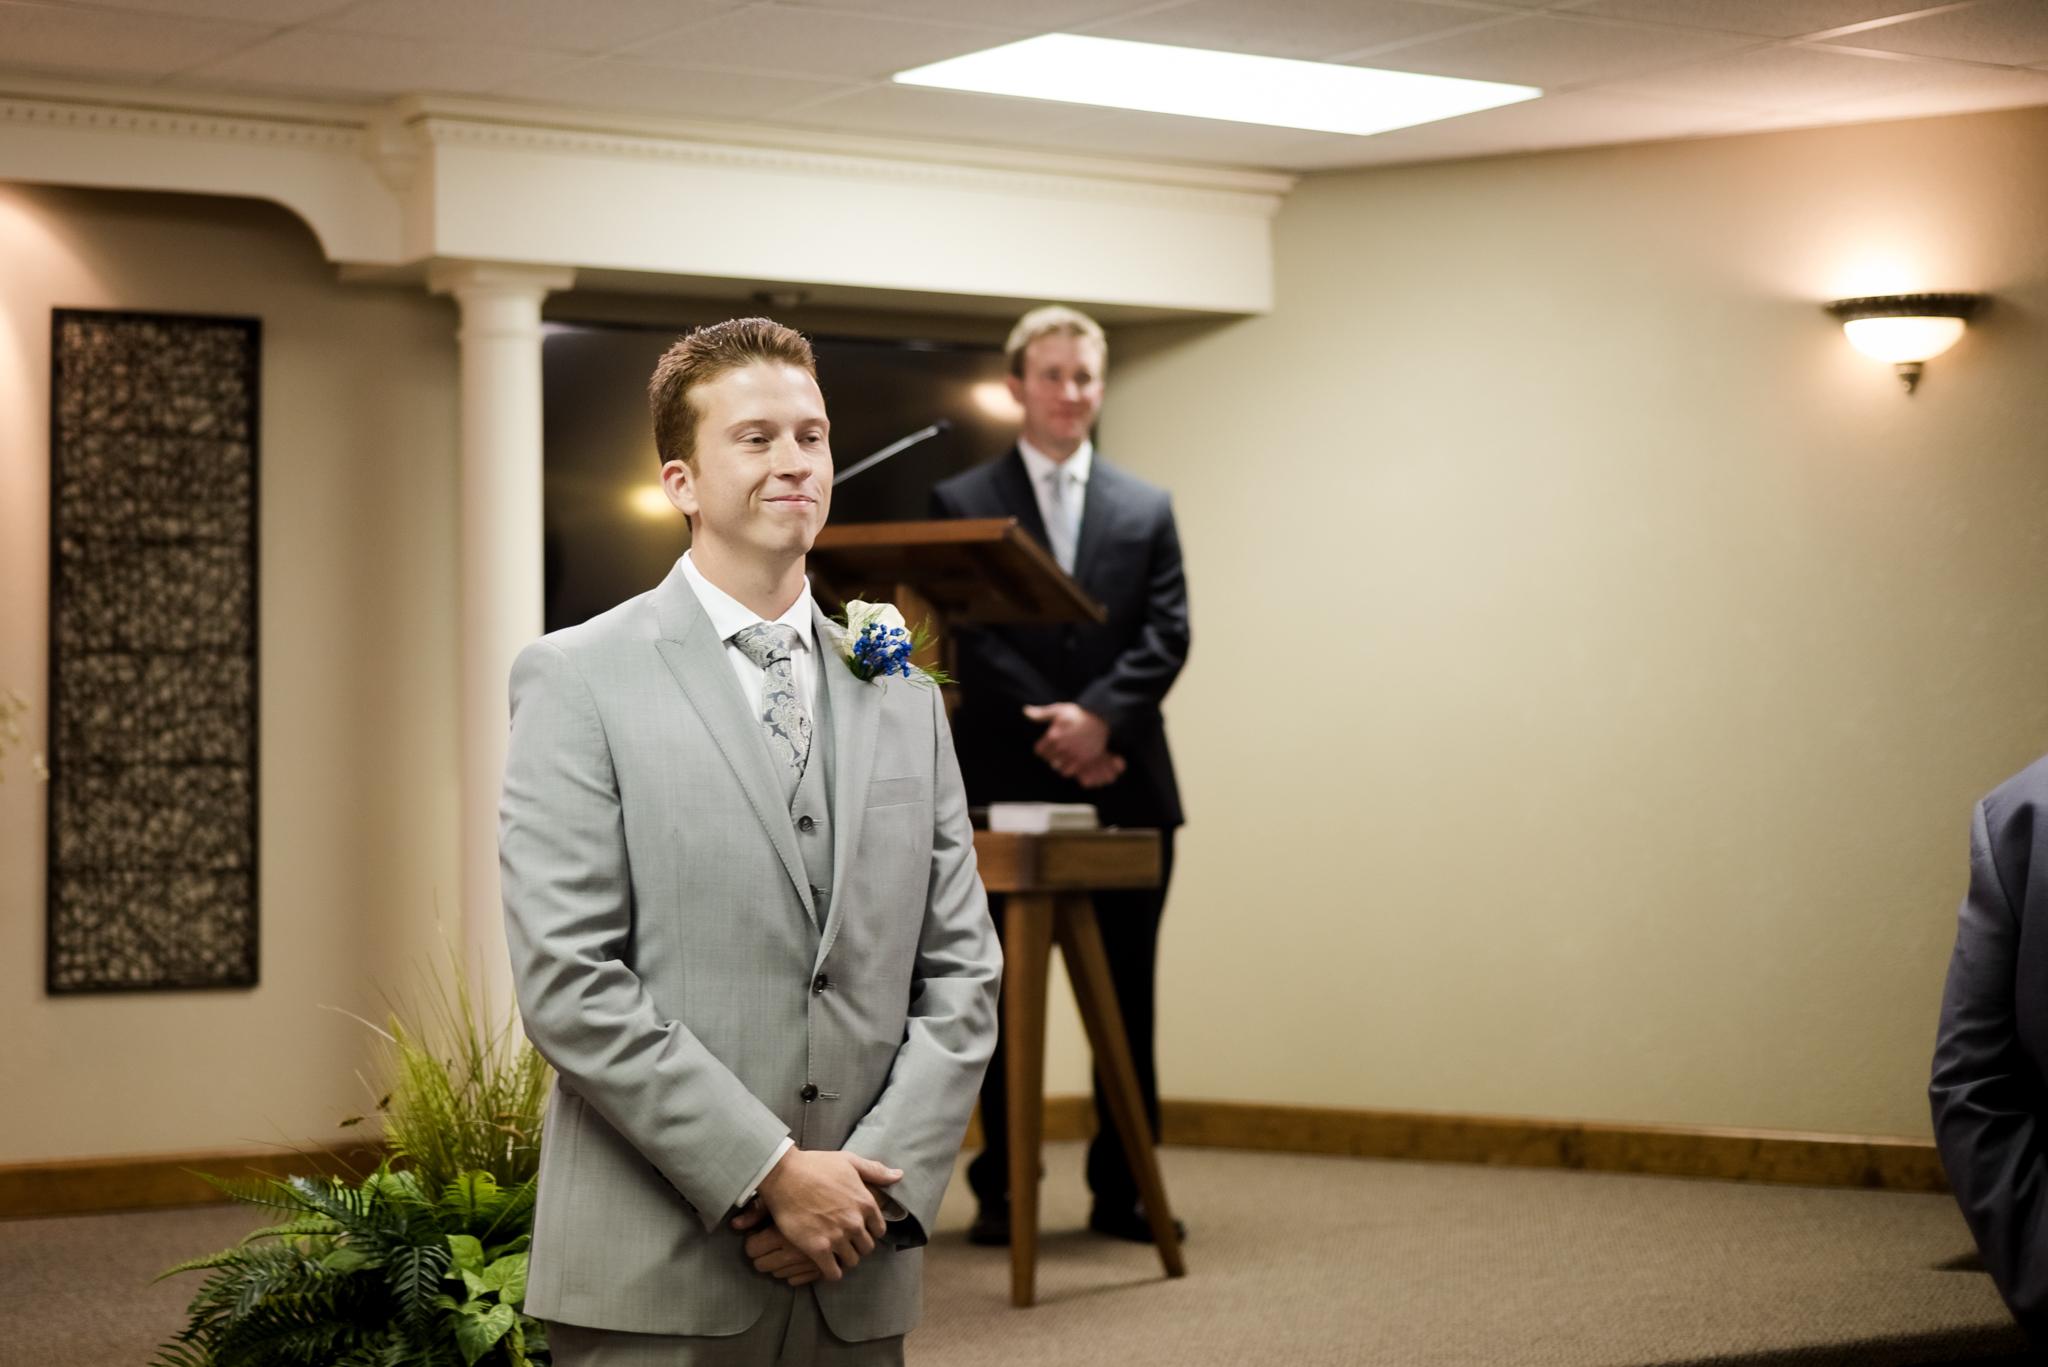 gibsonville-wedding-photography-021.jpg